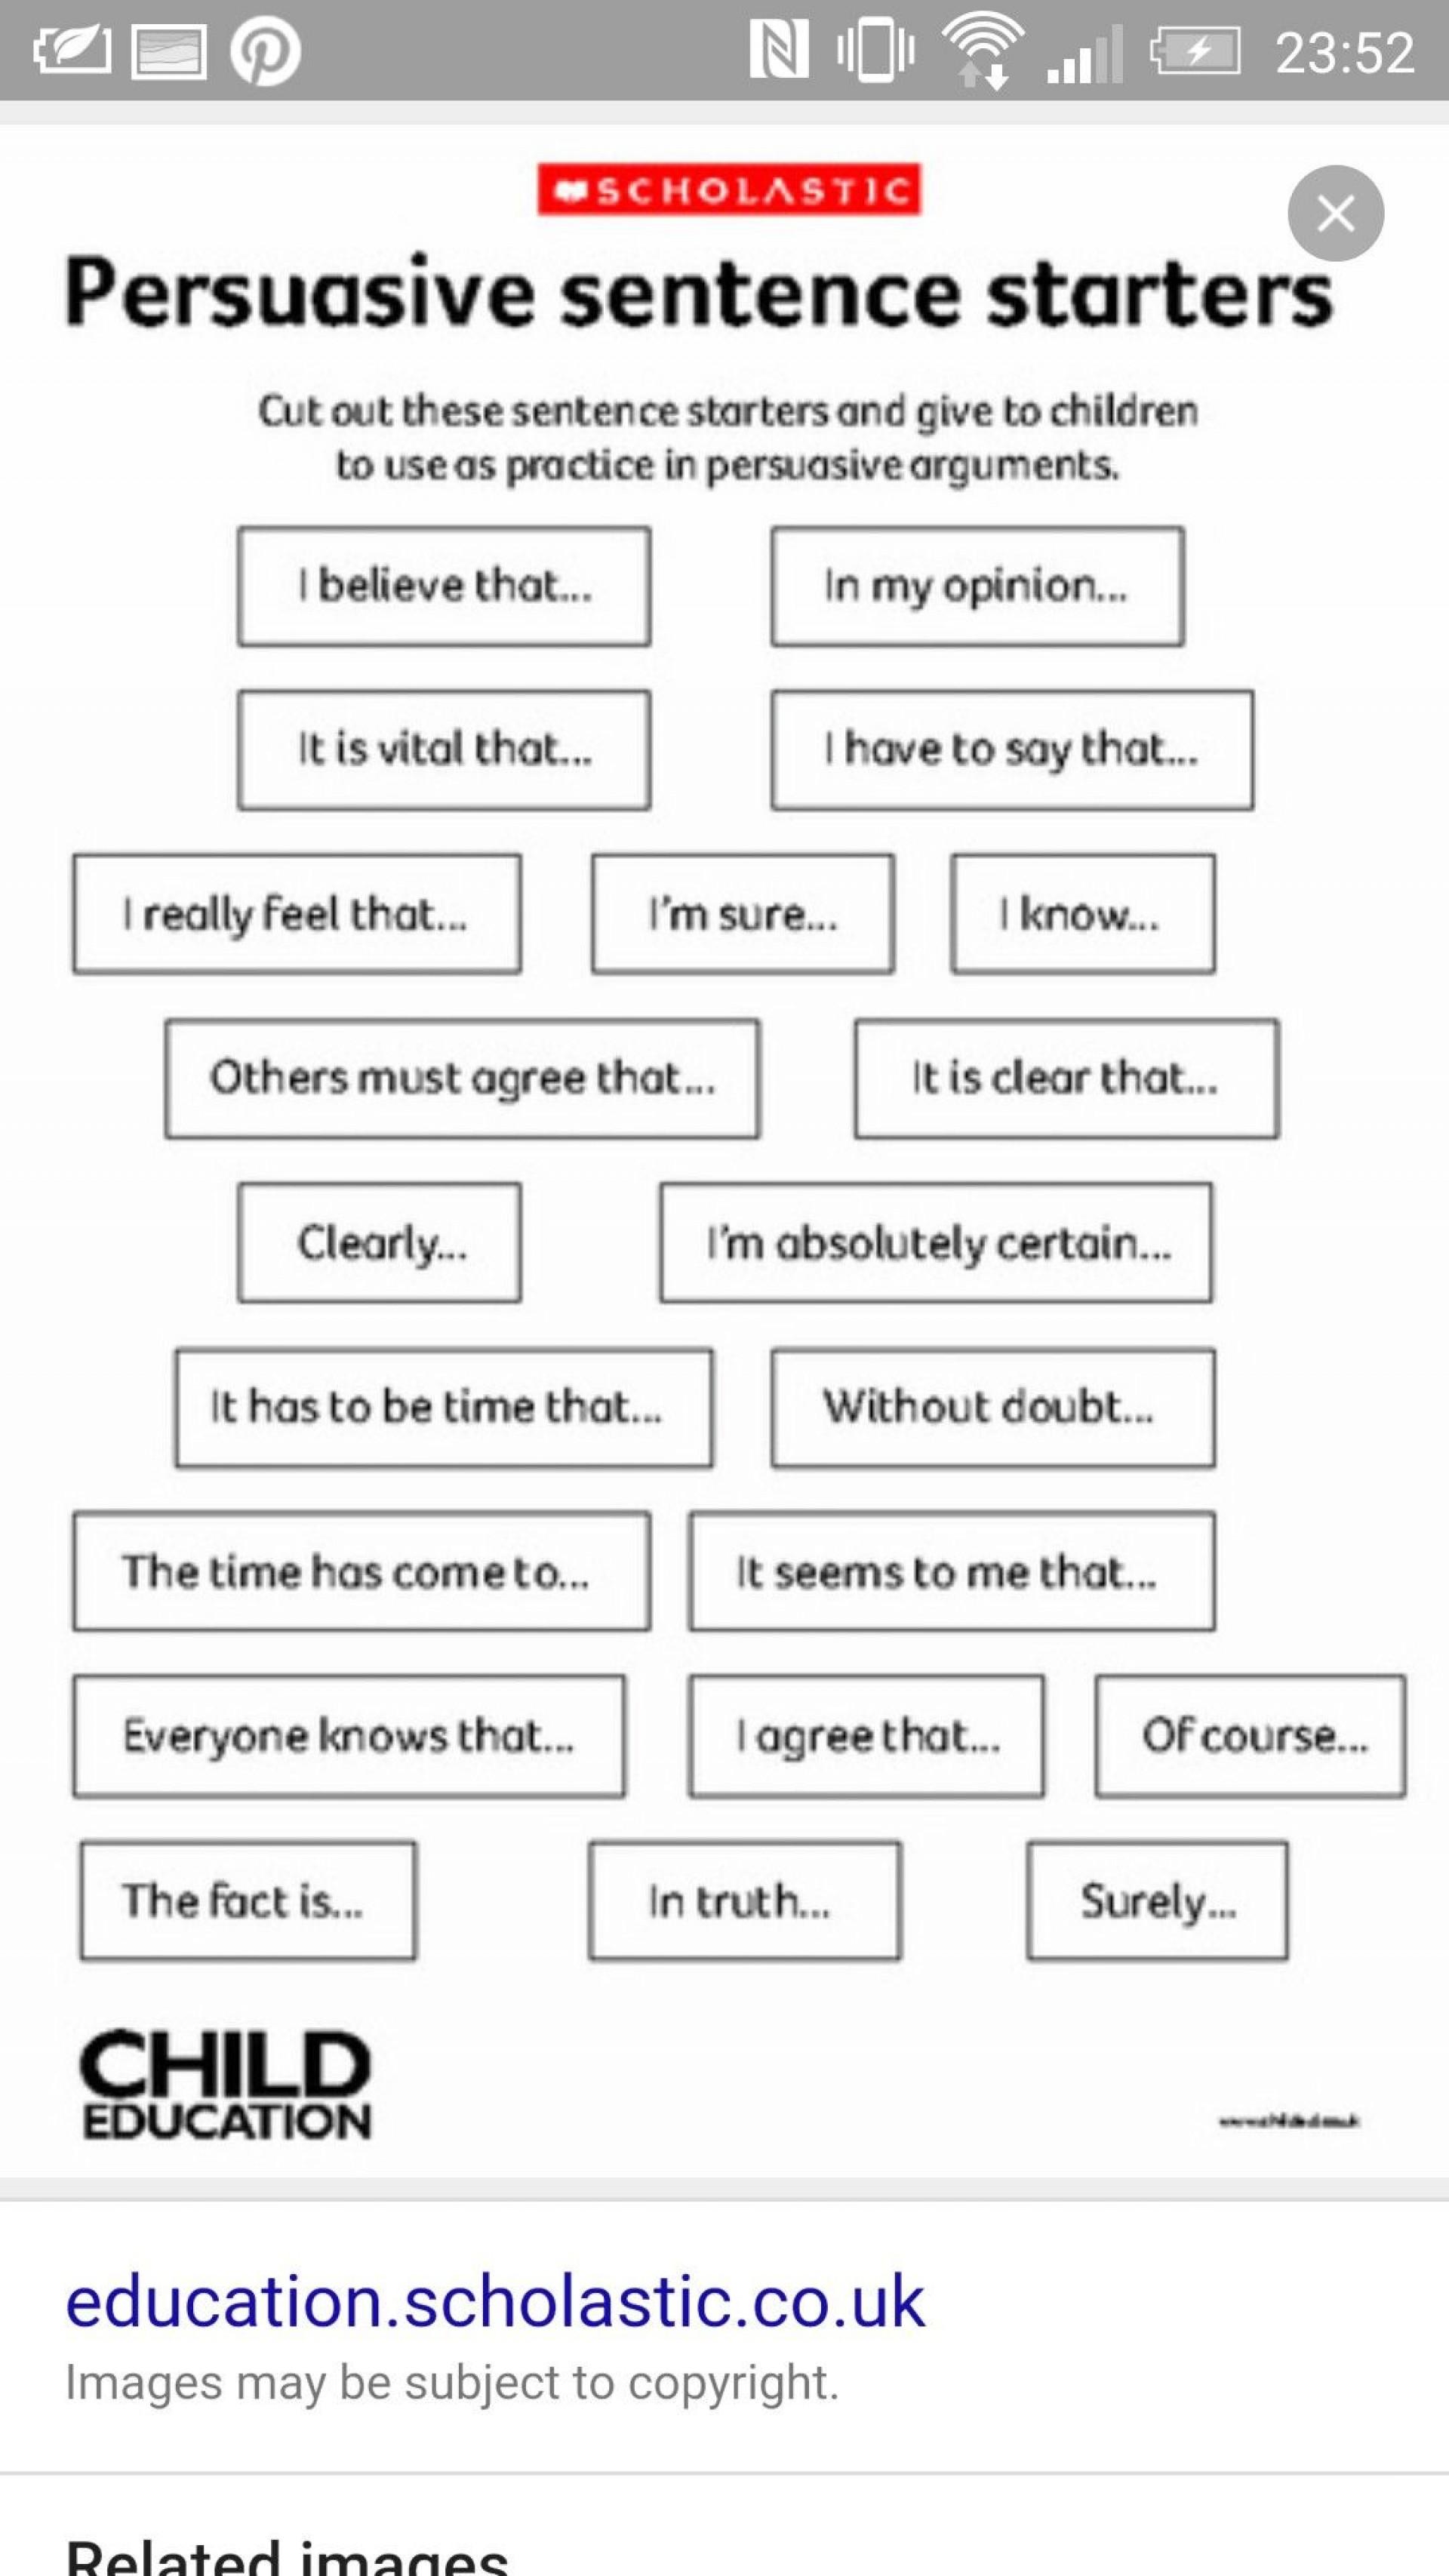 003 Essay Example Paragraph Starters Excellent Sentence Spanish Gcse 1920